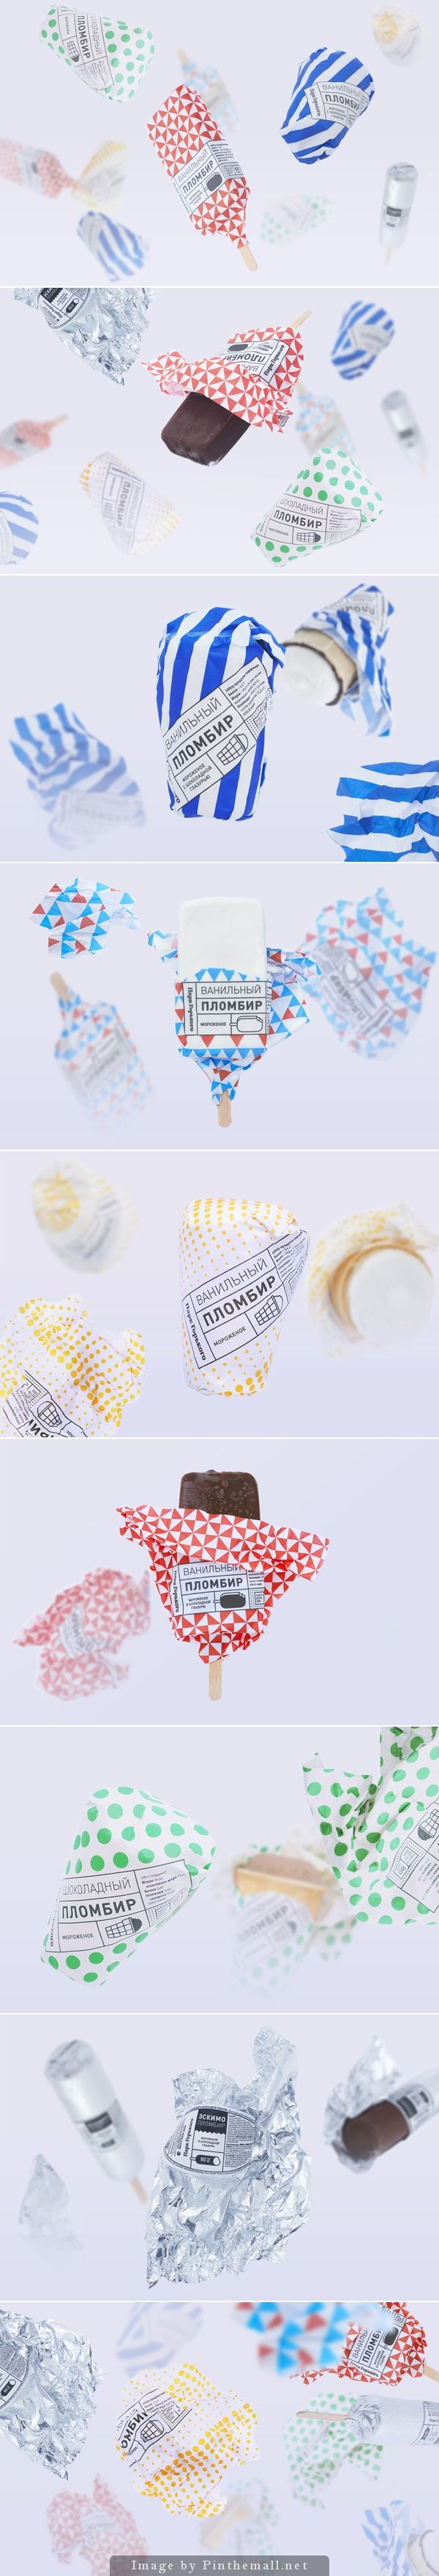 Gorky Park Icecream by Anastasia Genkina. Great ice cream packaging is always popular PD